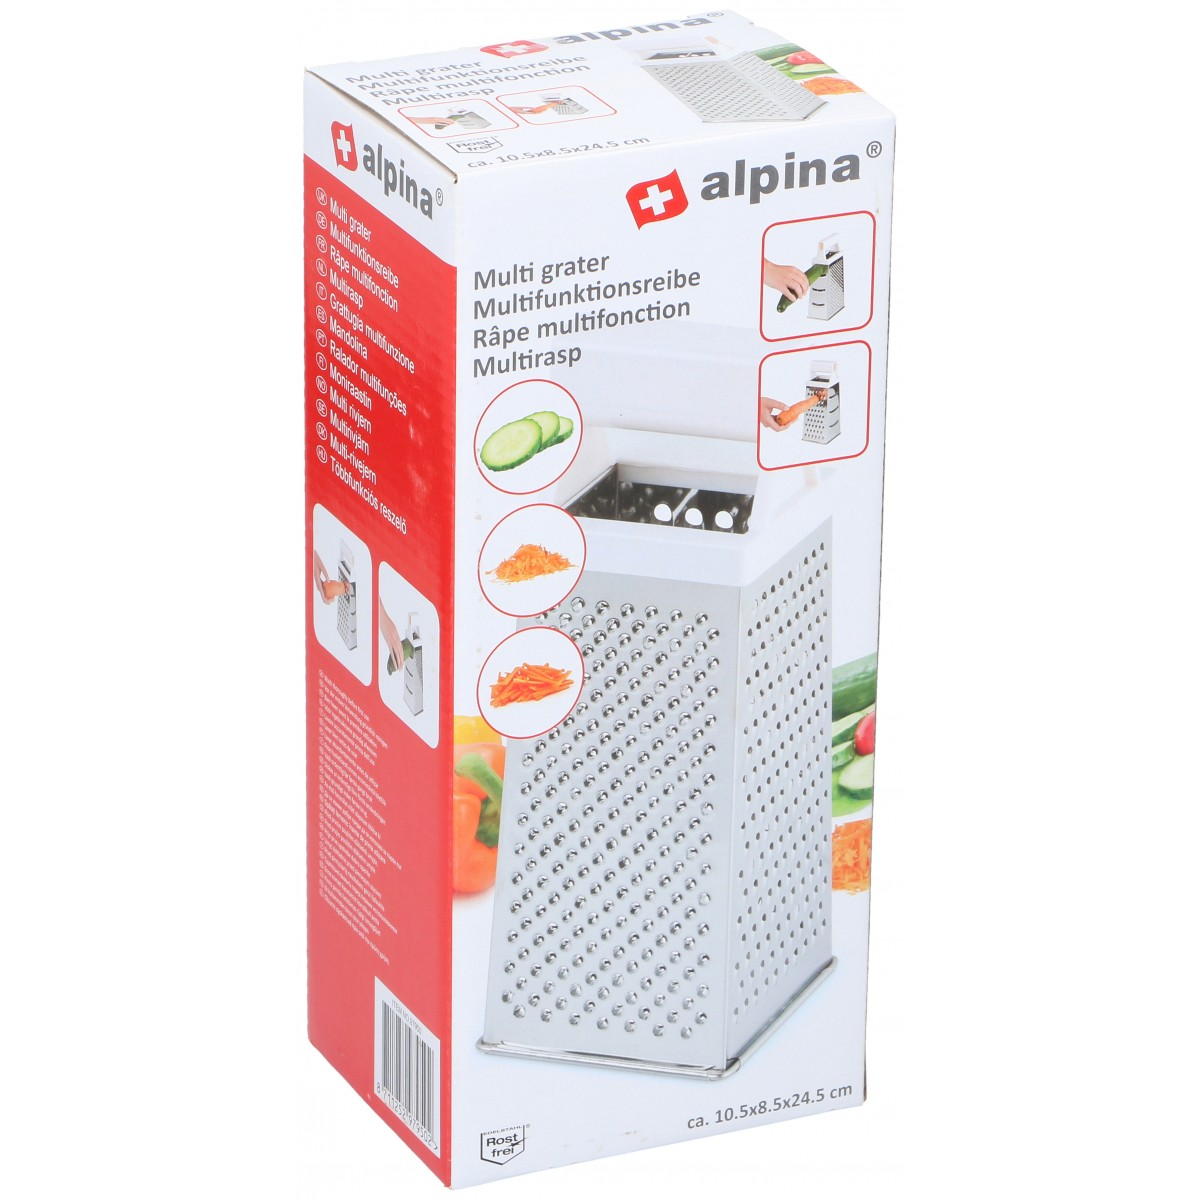 ALPINA Multi rivejern 10,5 x 8,5 x 24,5cm